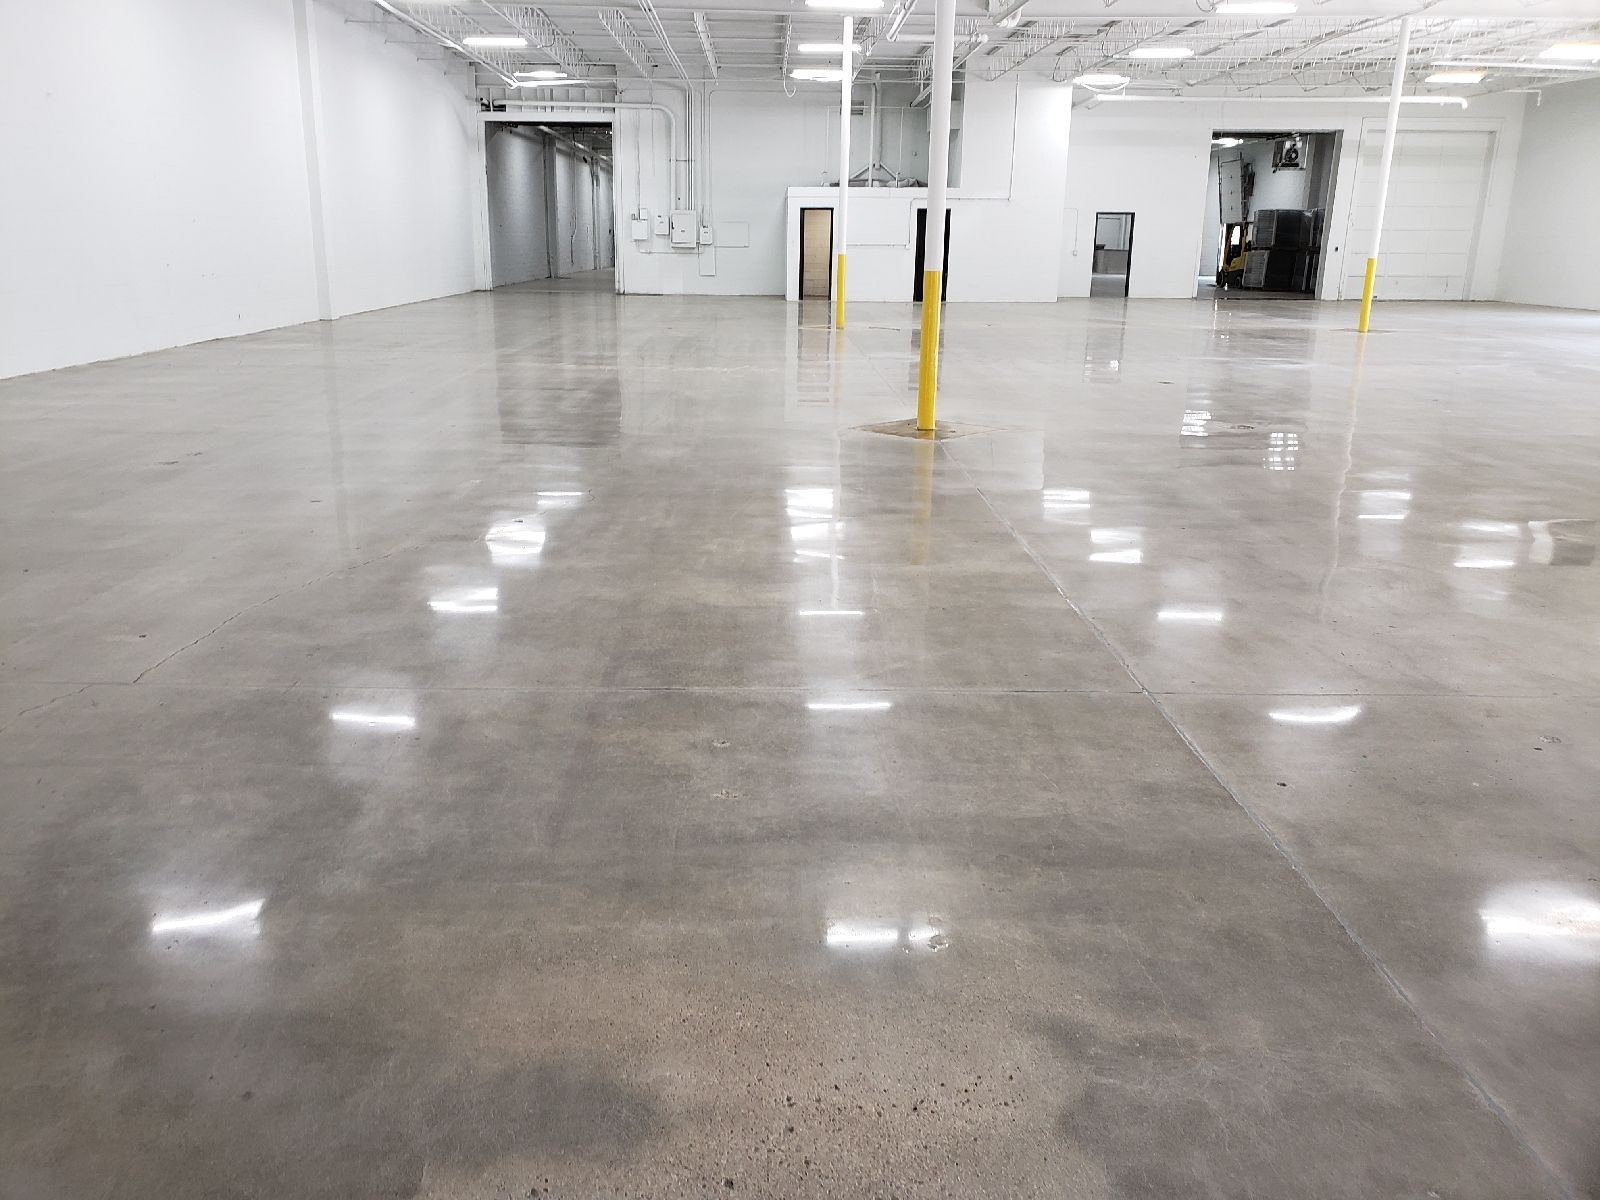 Concrete Polishing Contractor Findlay Ohio In 2020 Polished Cement Floors Concrete Floors Polished Concrete